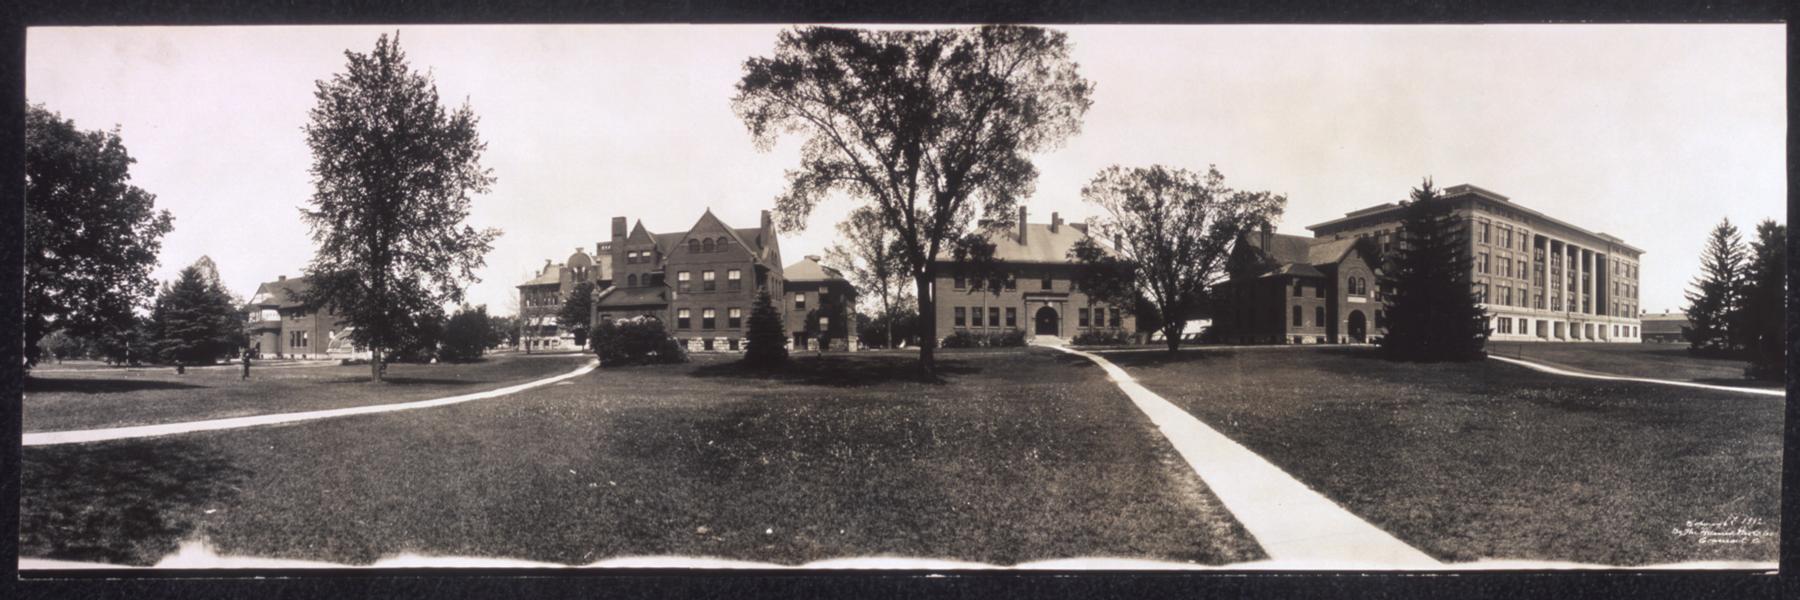 Michigan Agricultural College, 1912